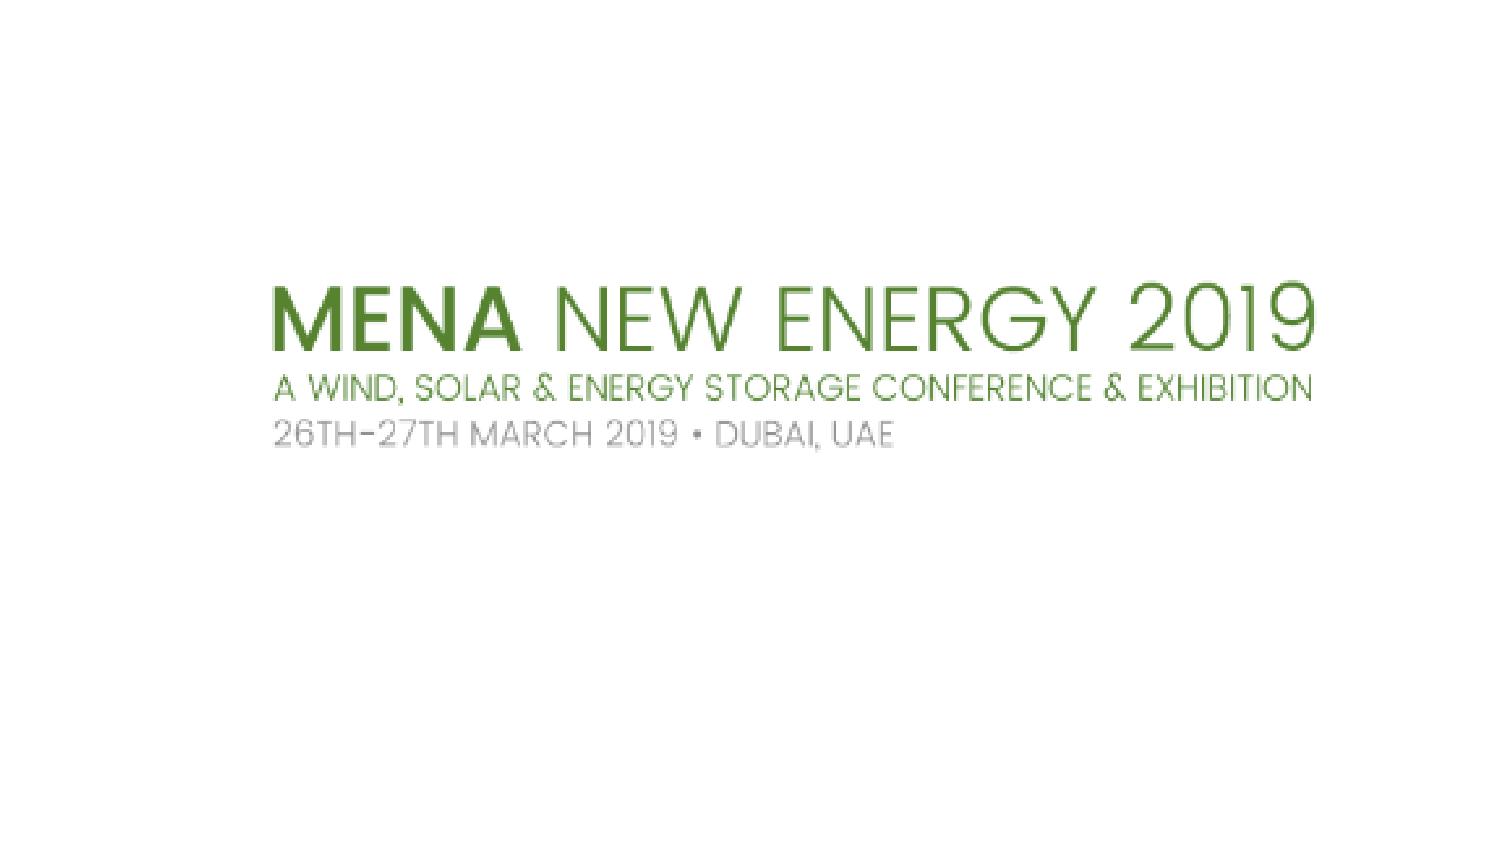 MENA New Energy Update 2019 – MESIA